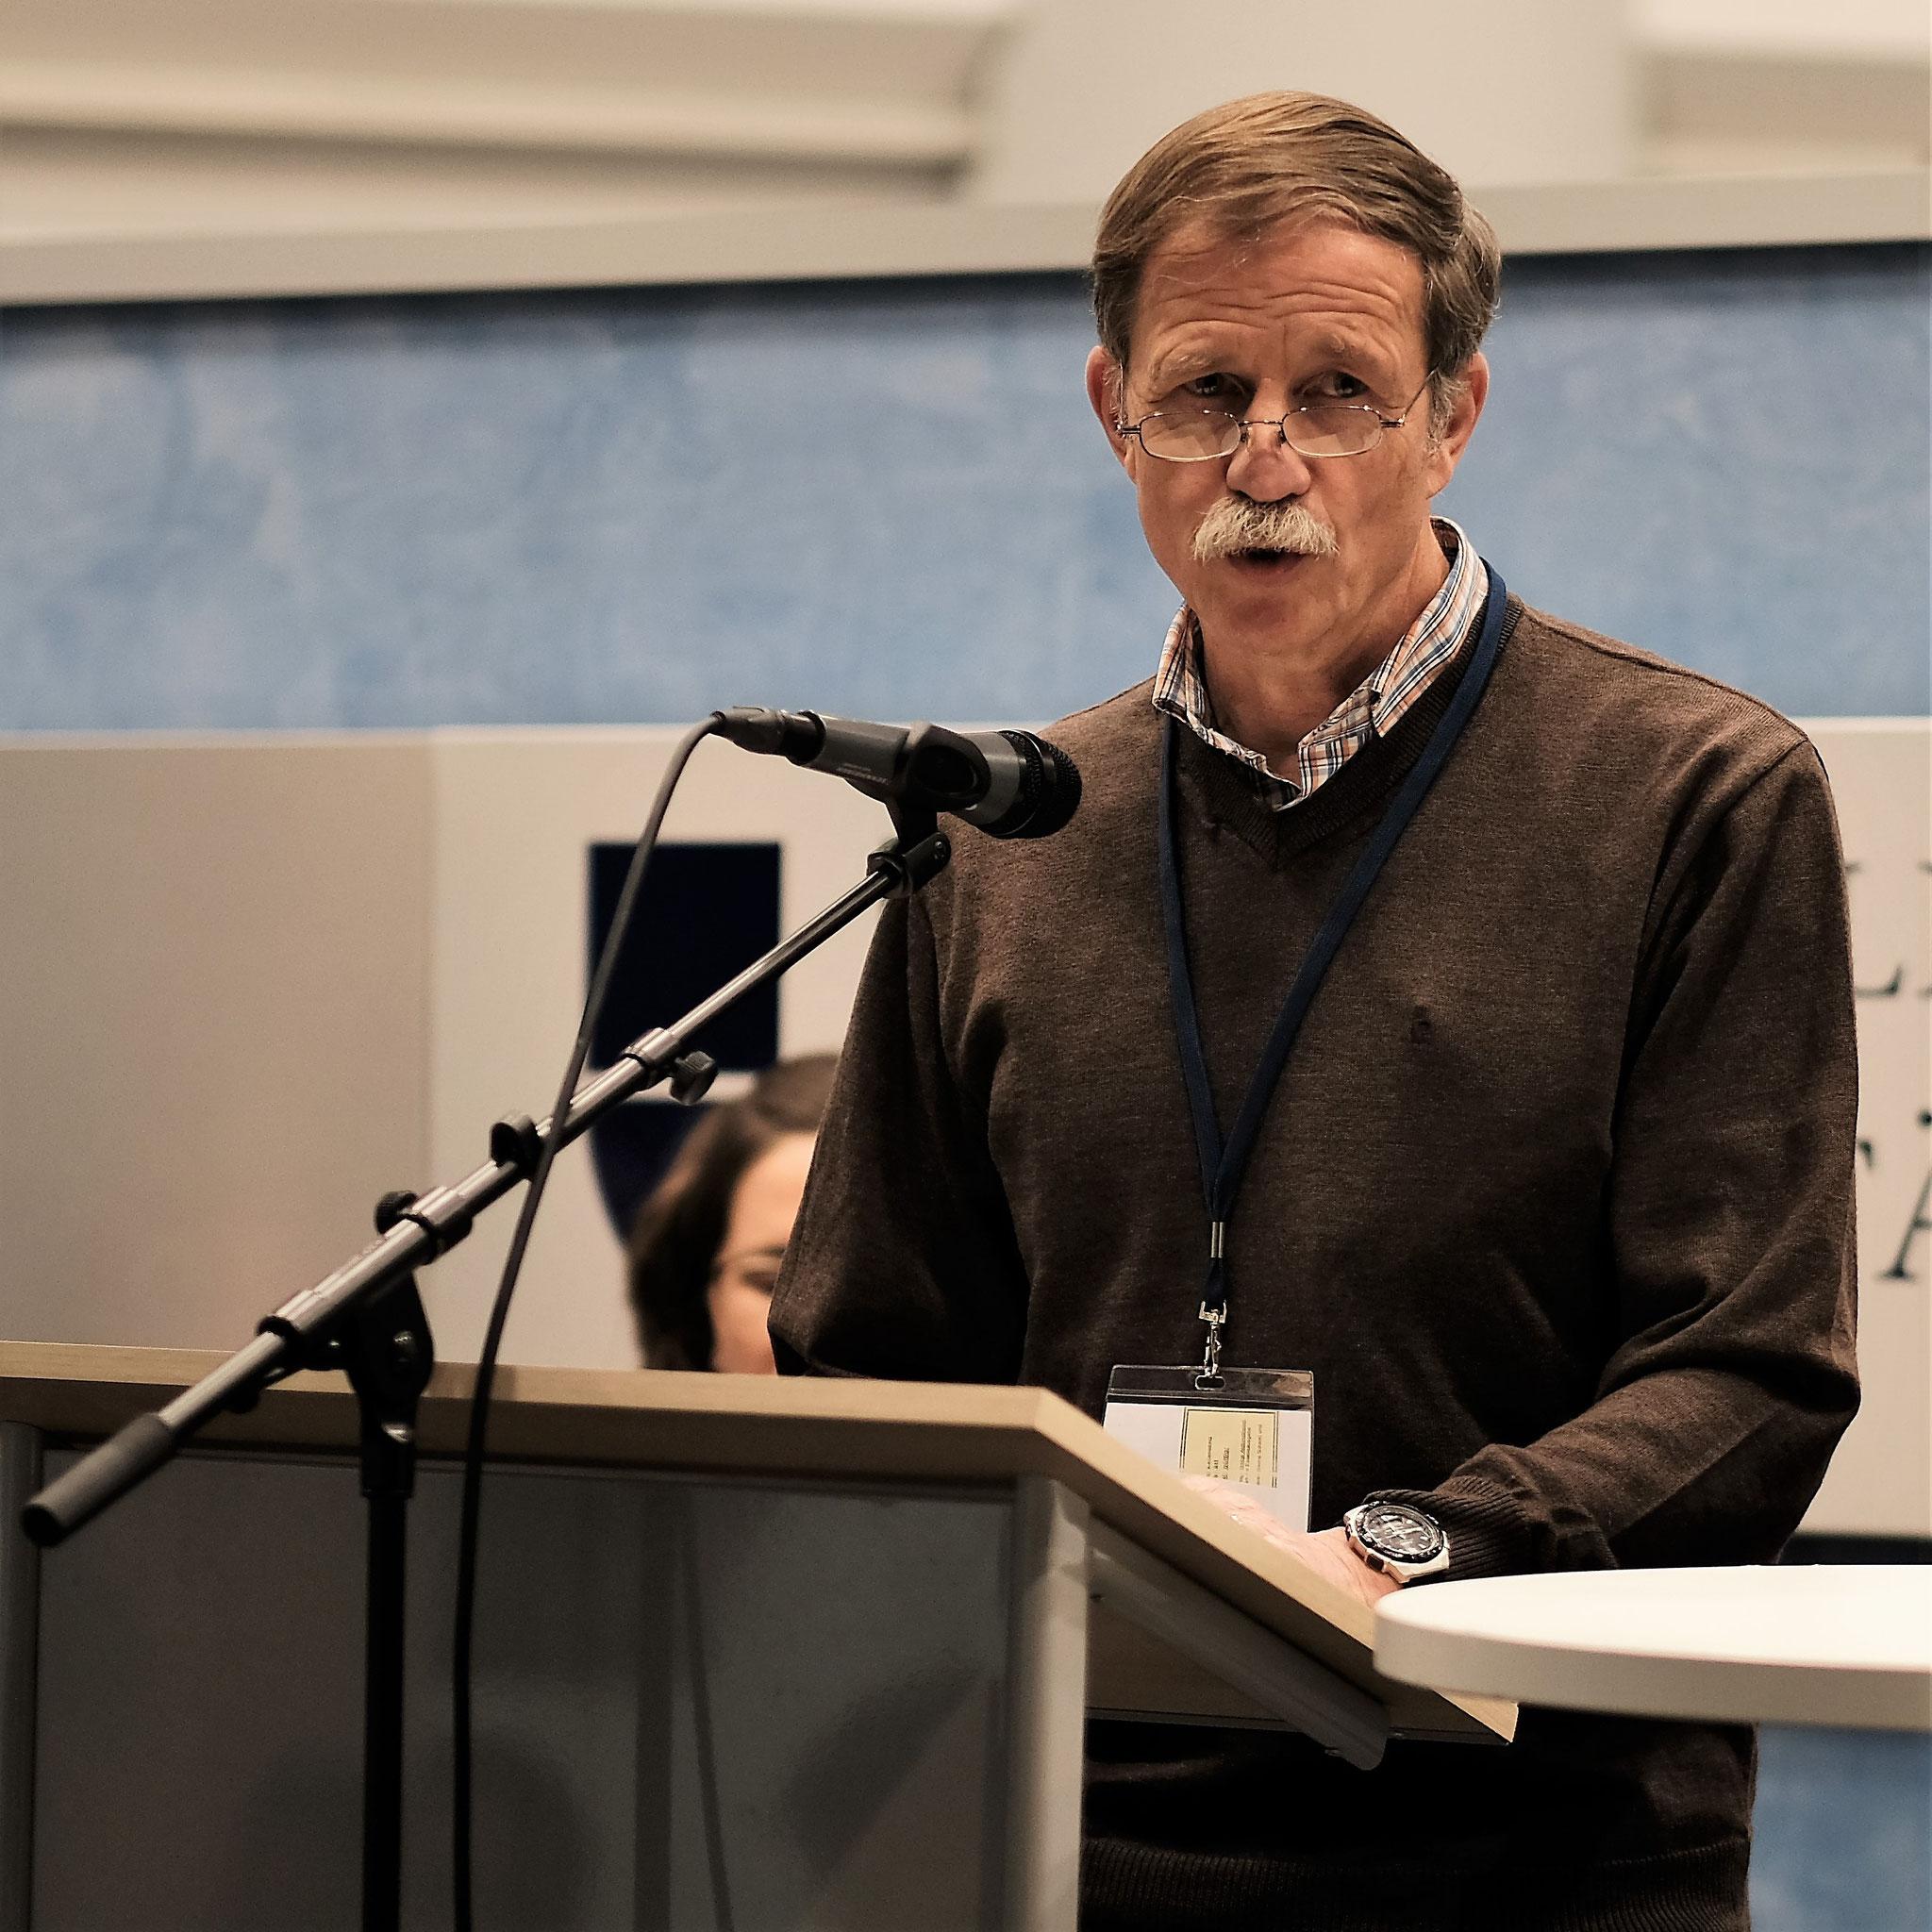 Dr. Adolf Diefenhardt